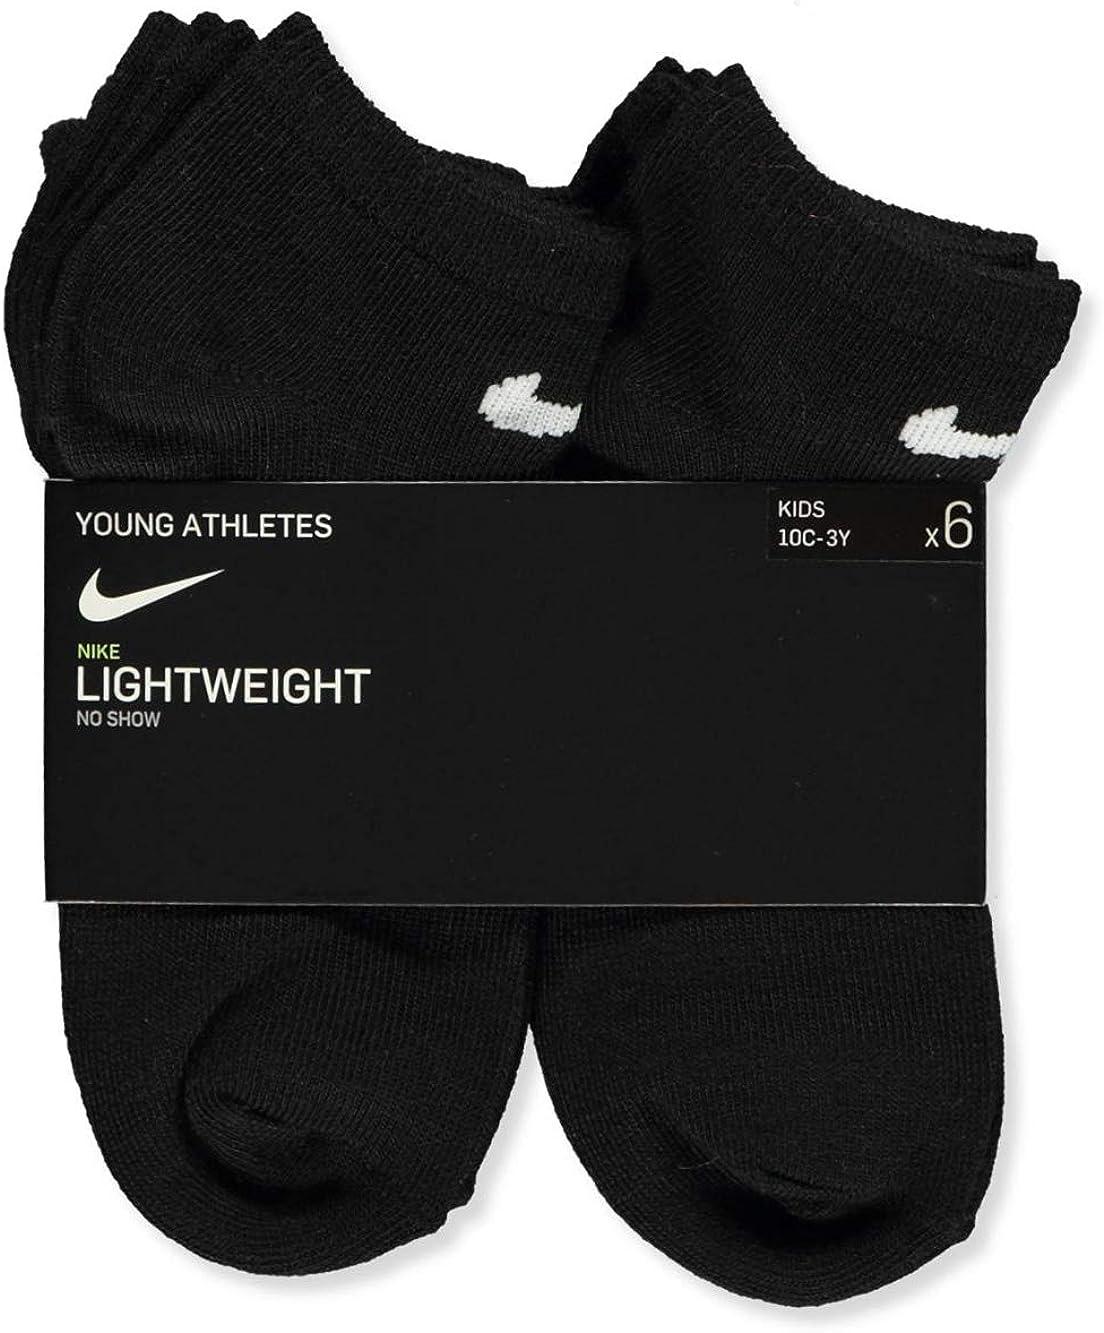 Nike Kids Young Athletes No Show Socks Black 6 Pairs Size